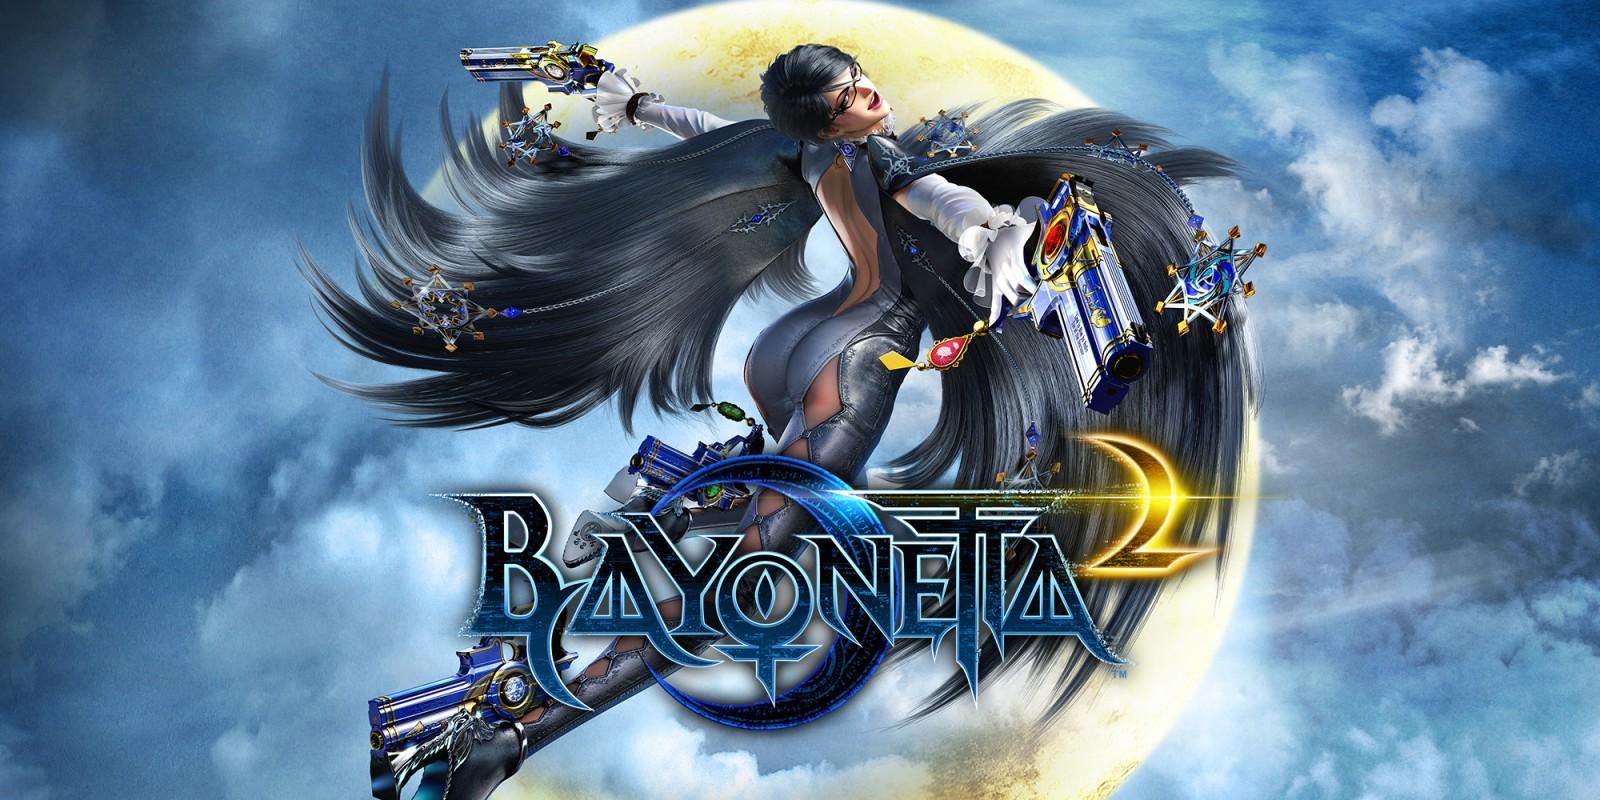 Bayonetta 2 Nintendo Switch Review